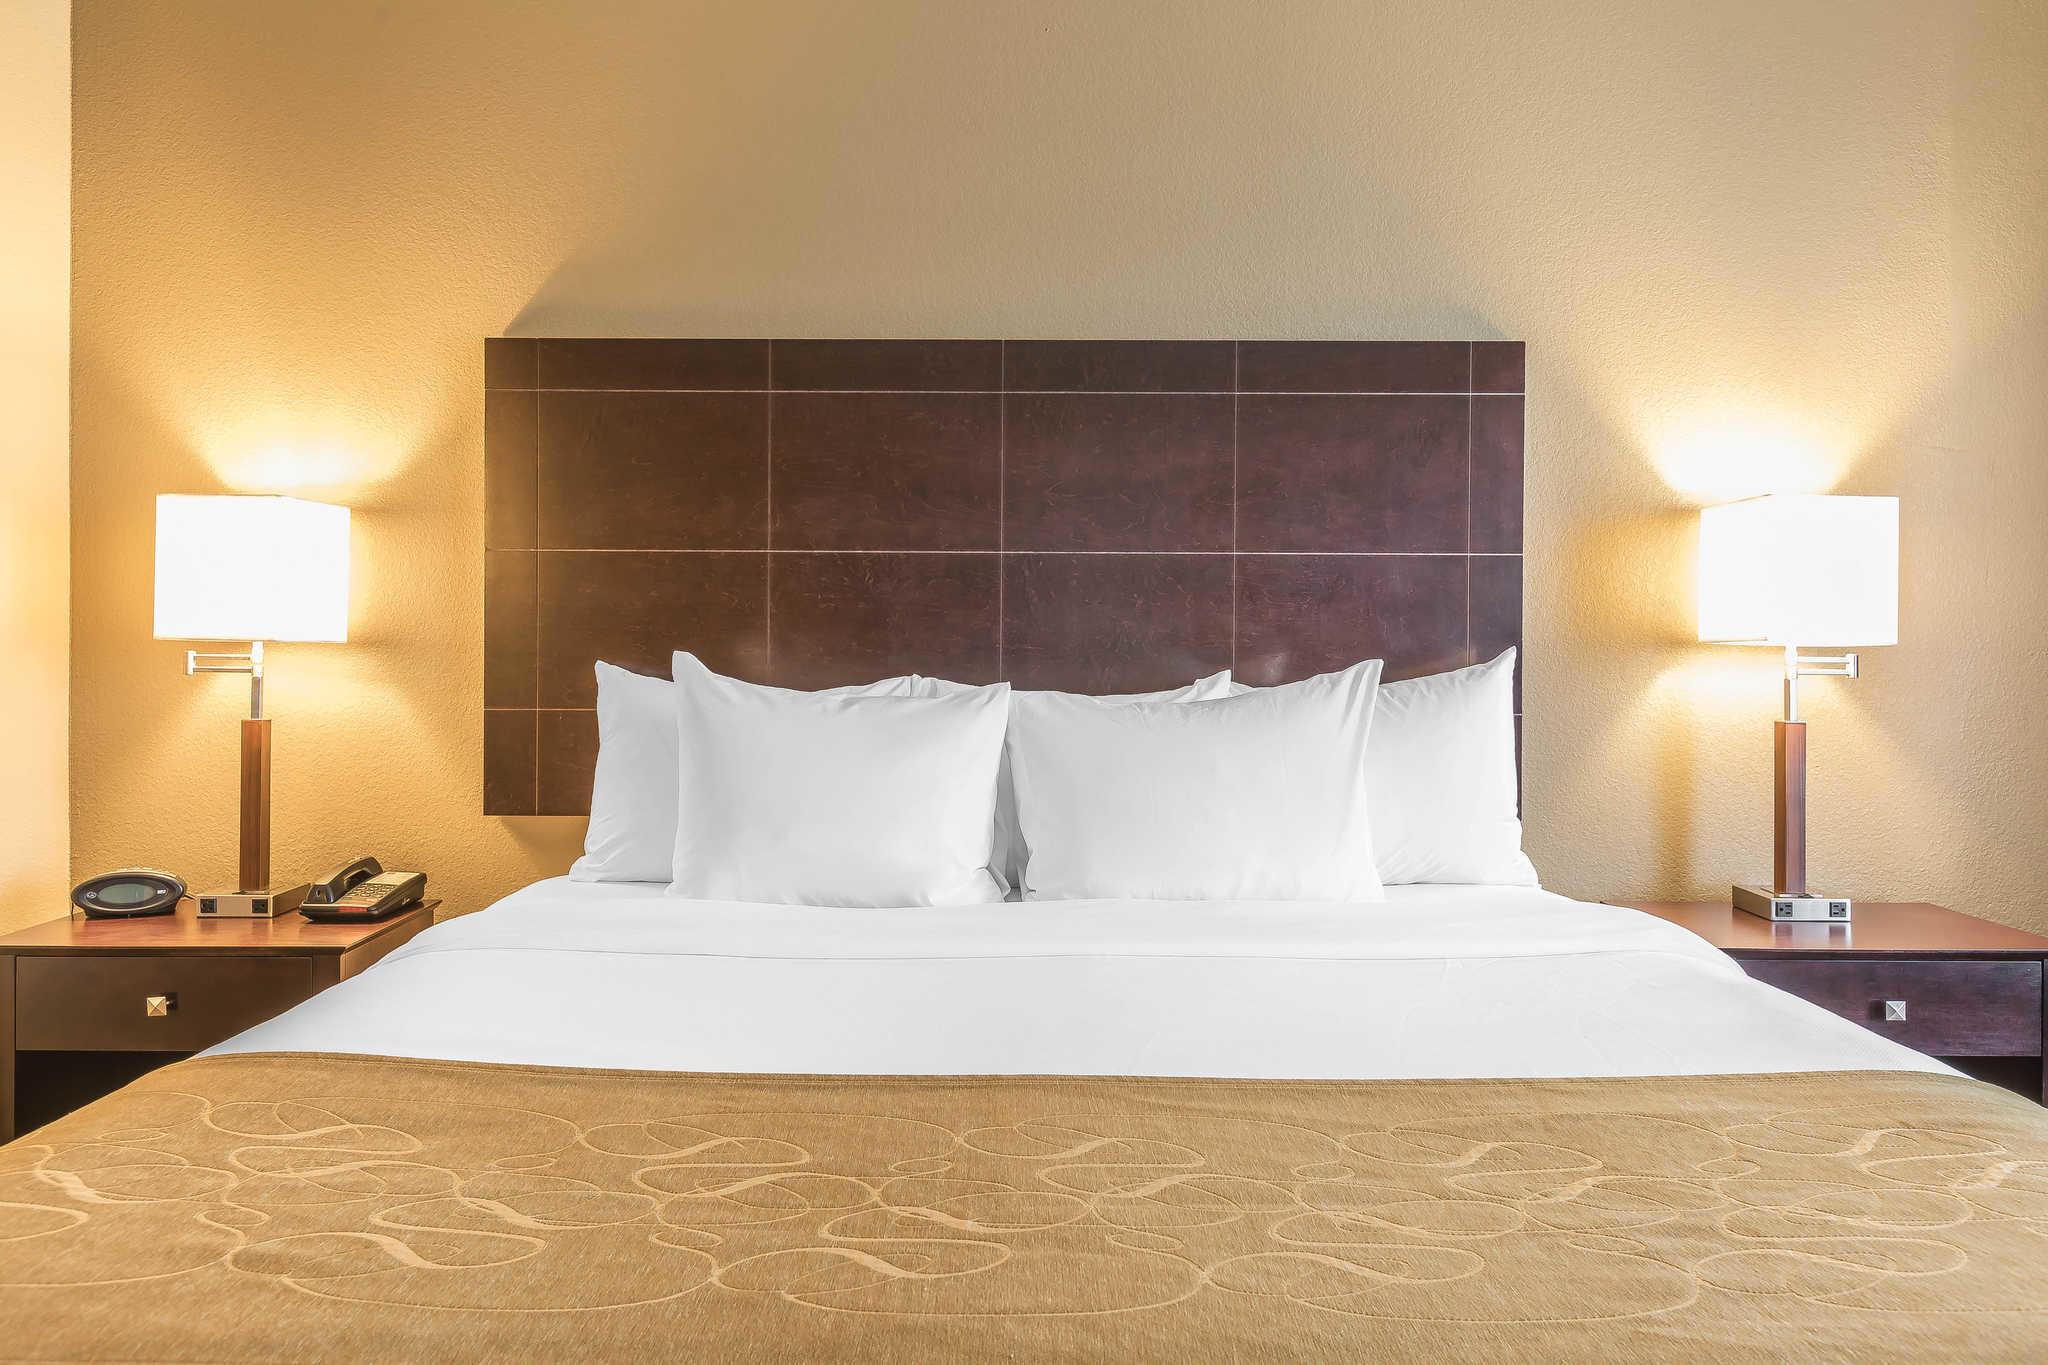 Comfort Suites North image 12